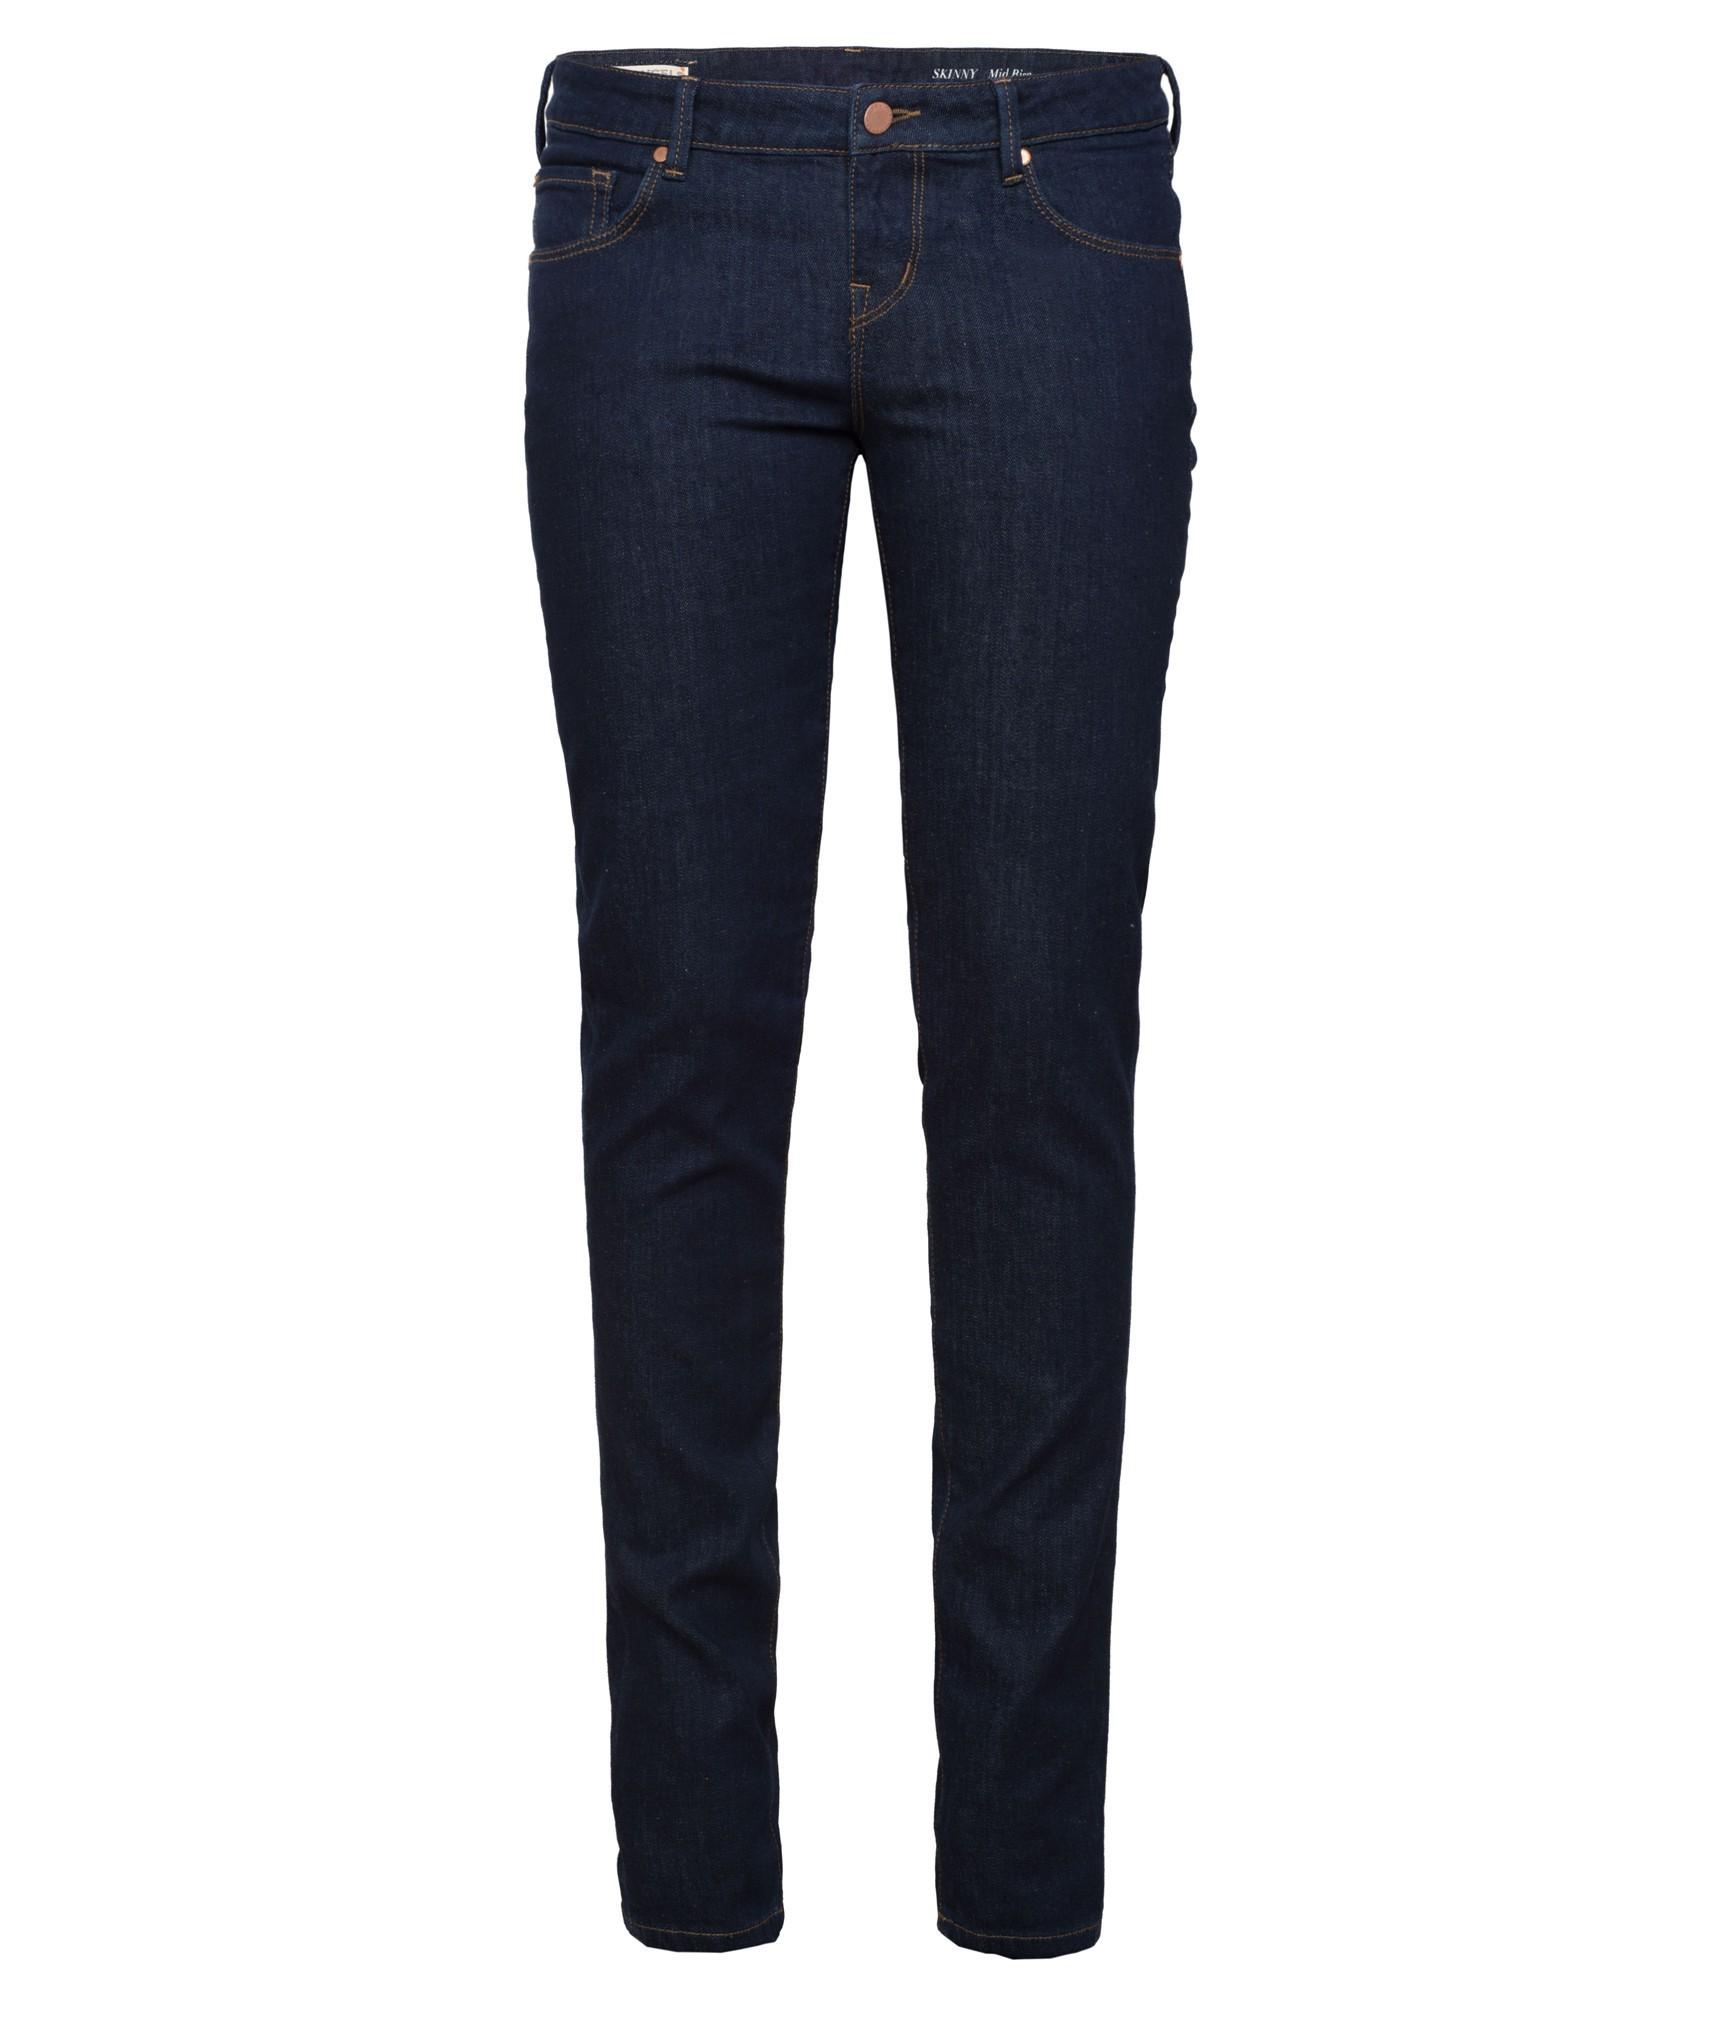 armedangels tilly jeans bio jeans f r damen bei glore glore. Black Bedroom Furniture Sets. Home Design Ideas